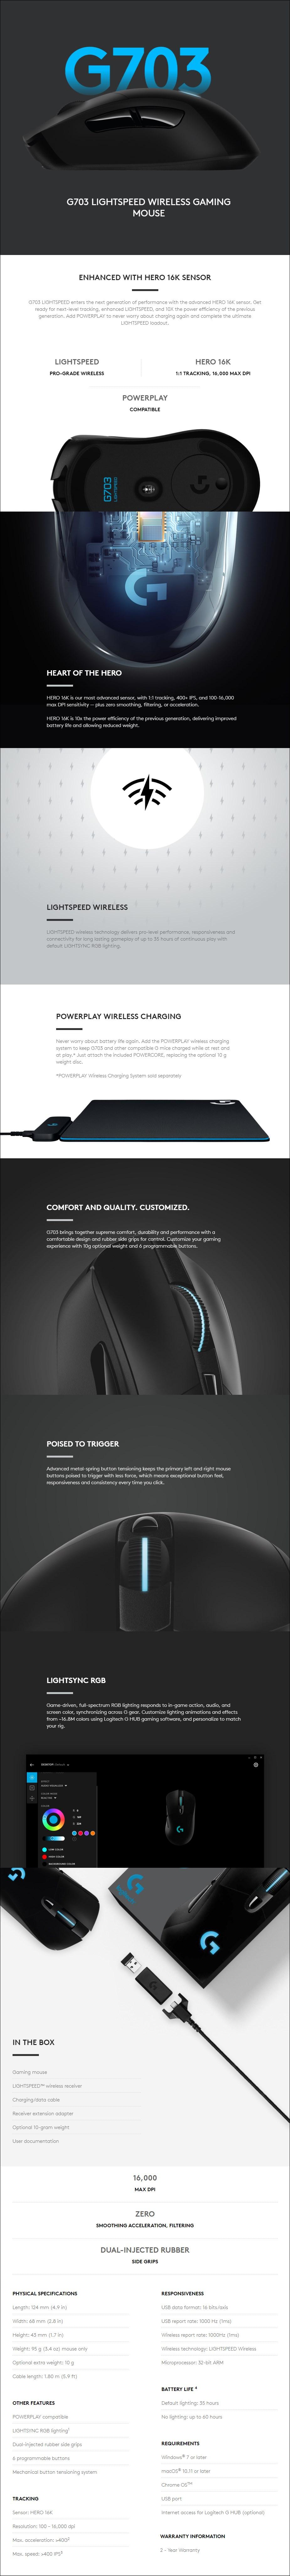 Logitech G703 HERO LIGHTSPEED Wireless Gaming Mouse - Overview 1